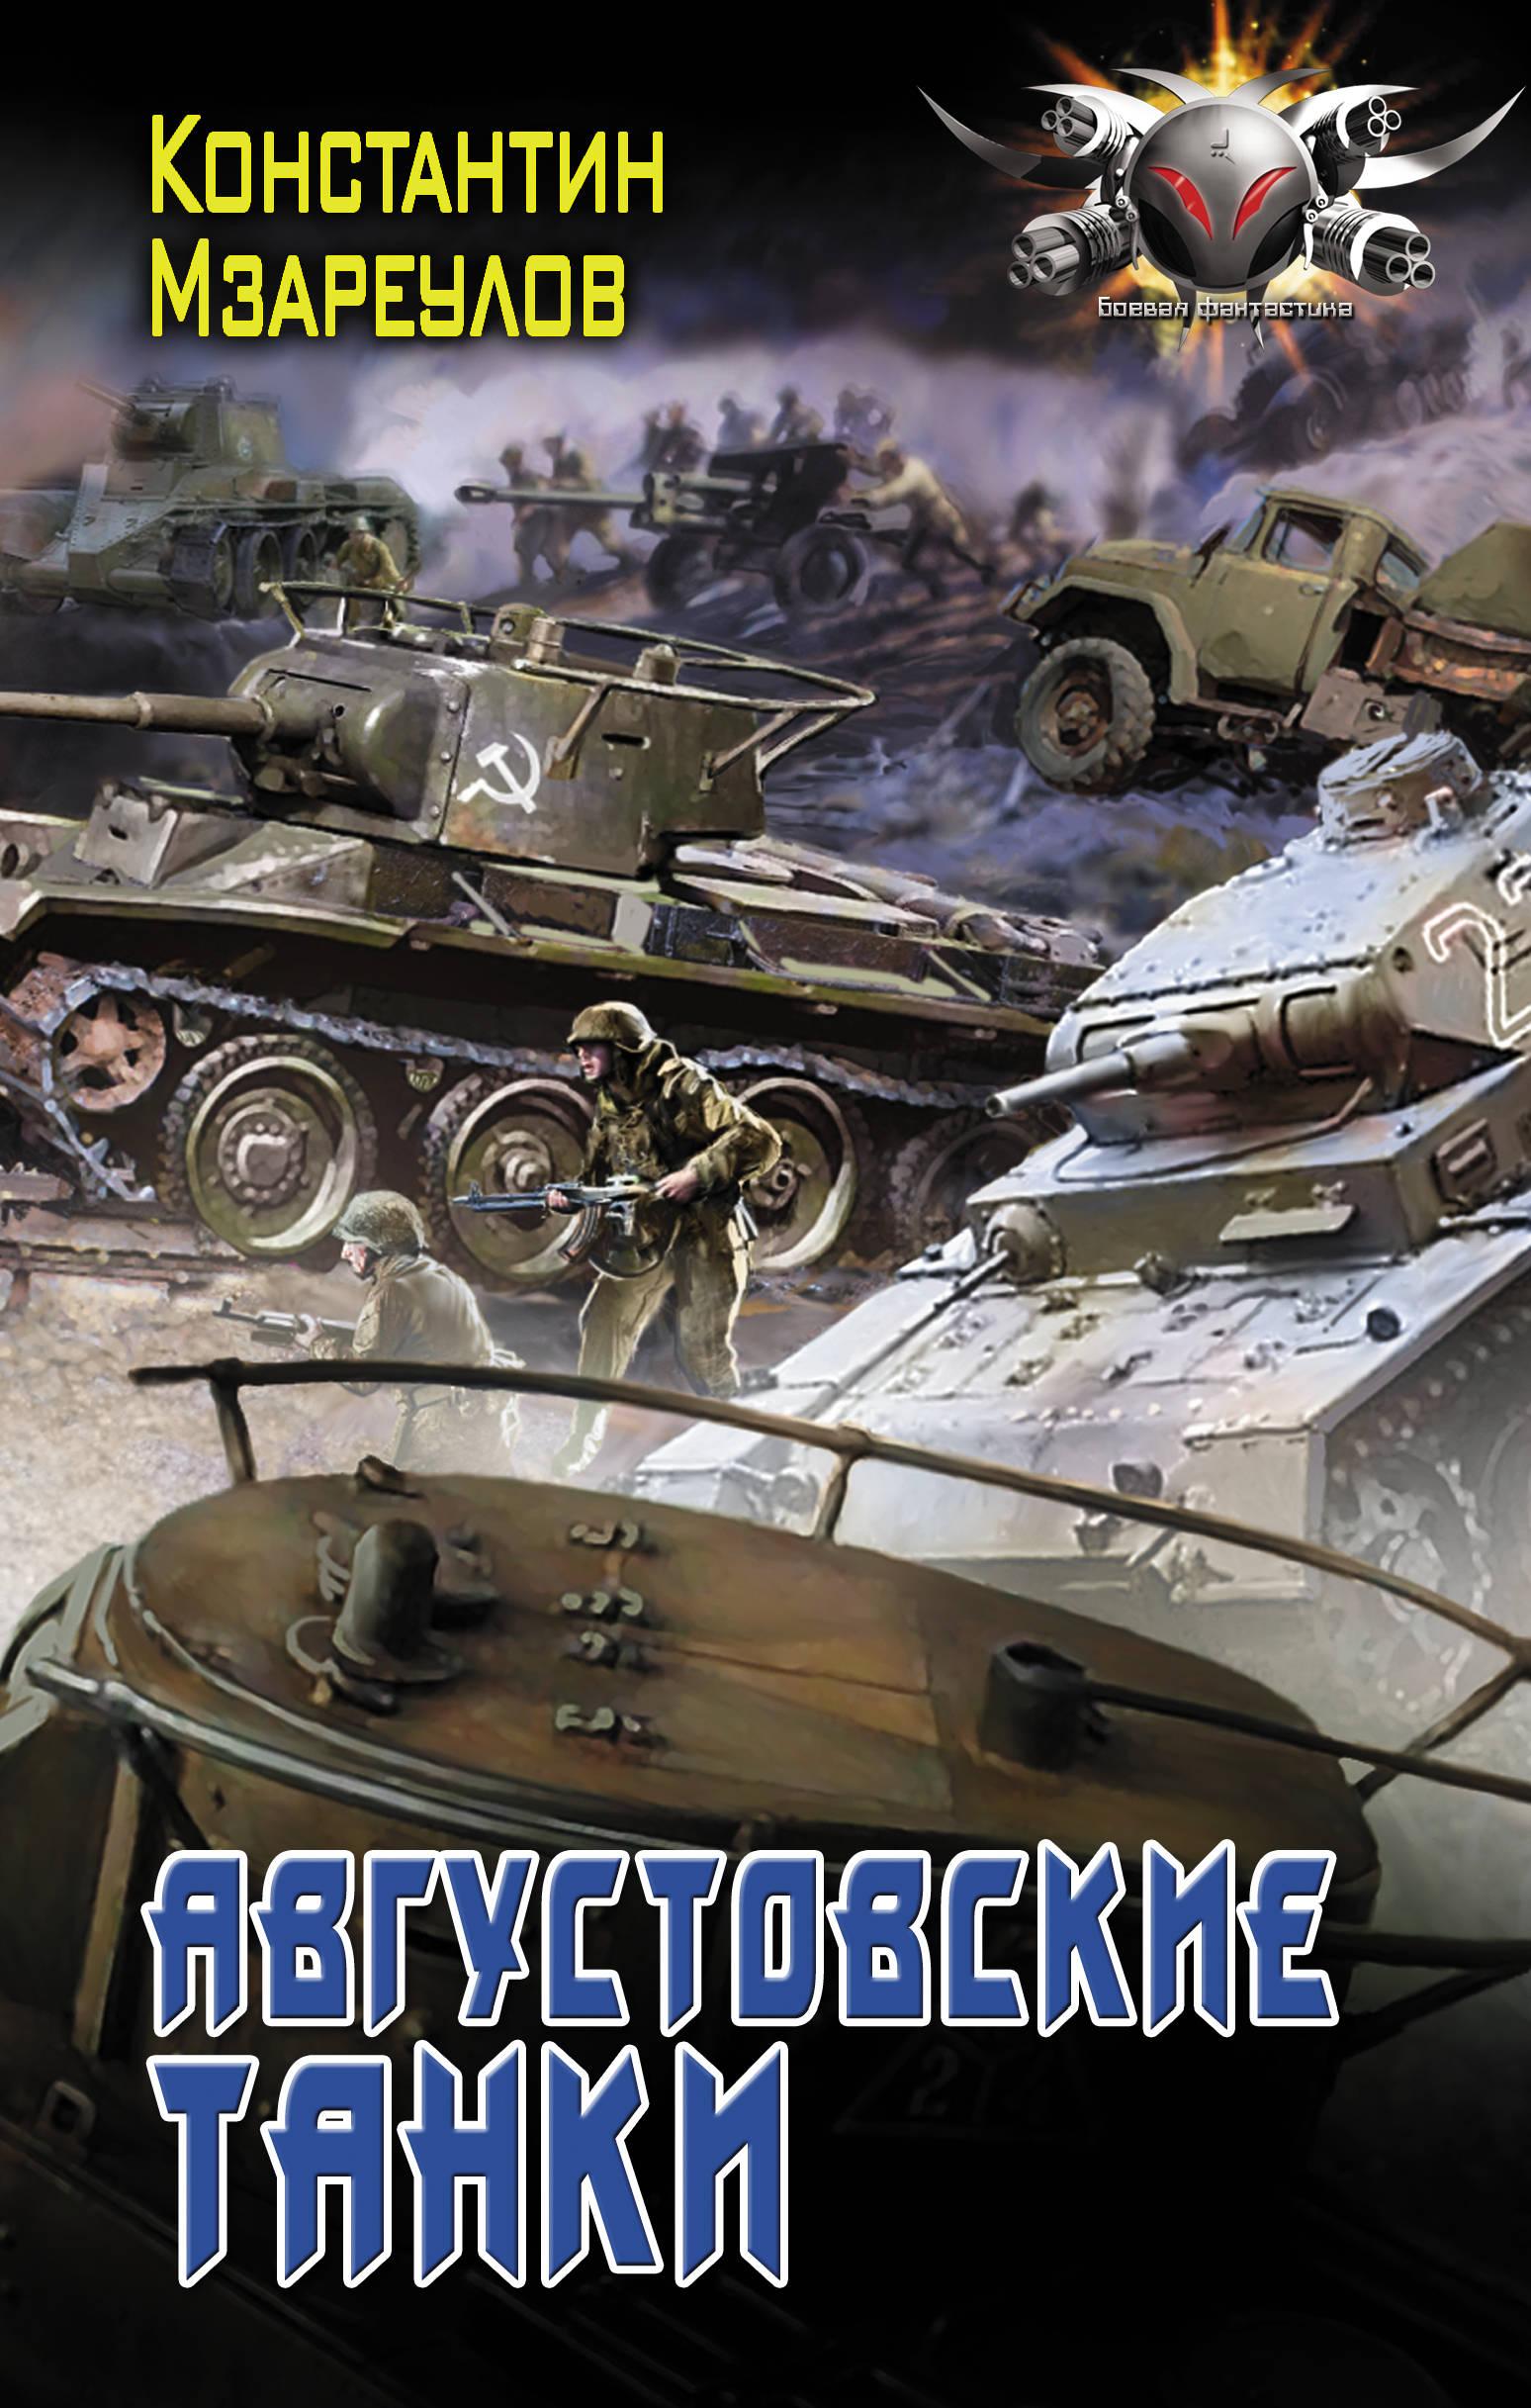 Константин Мзареулов Августовские танки